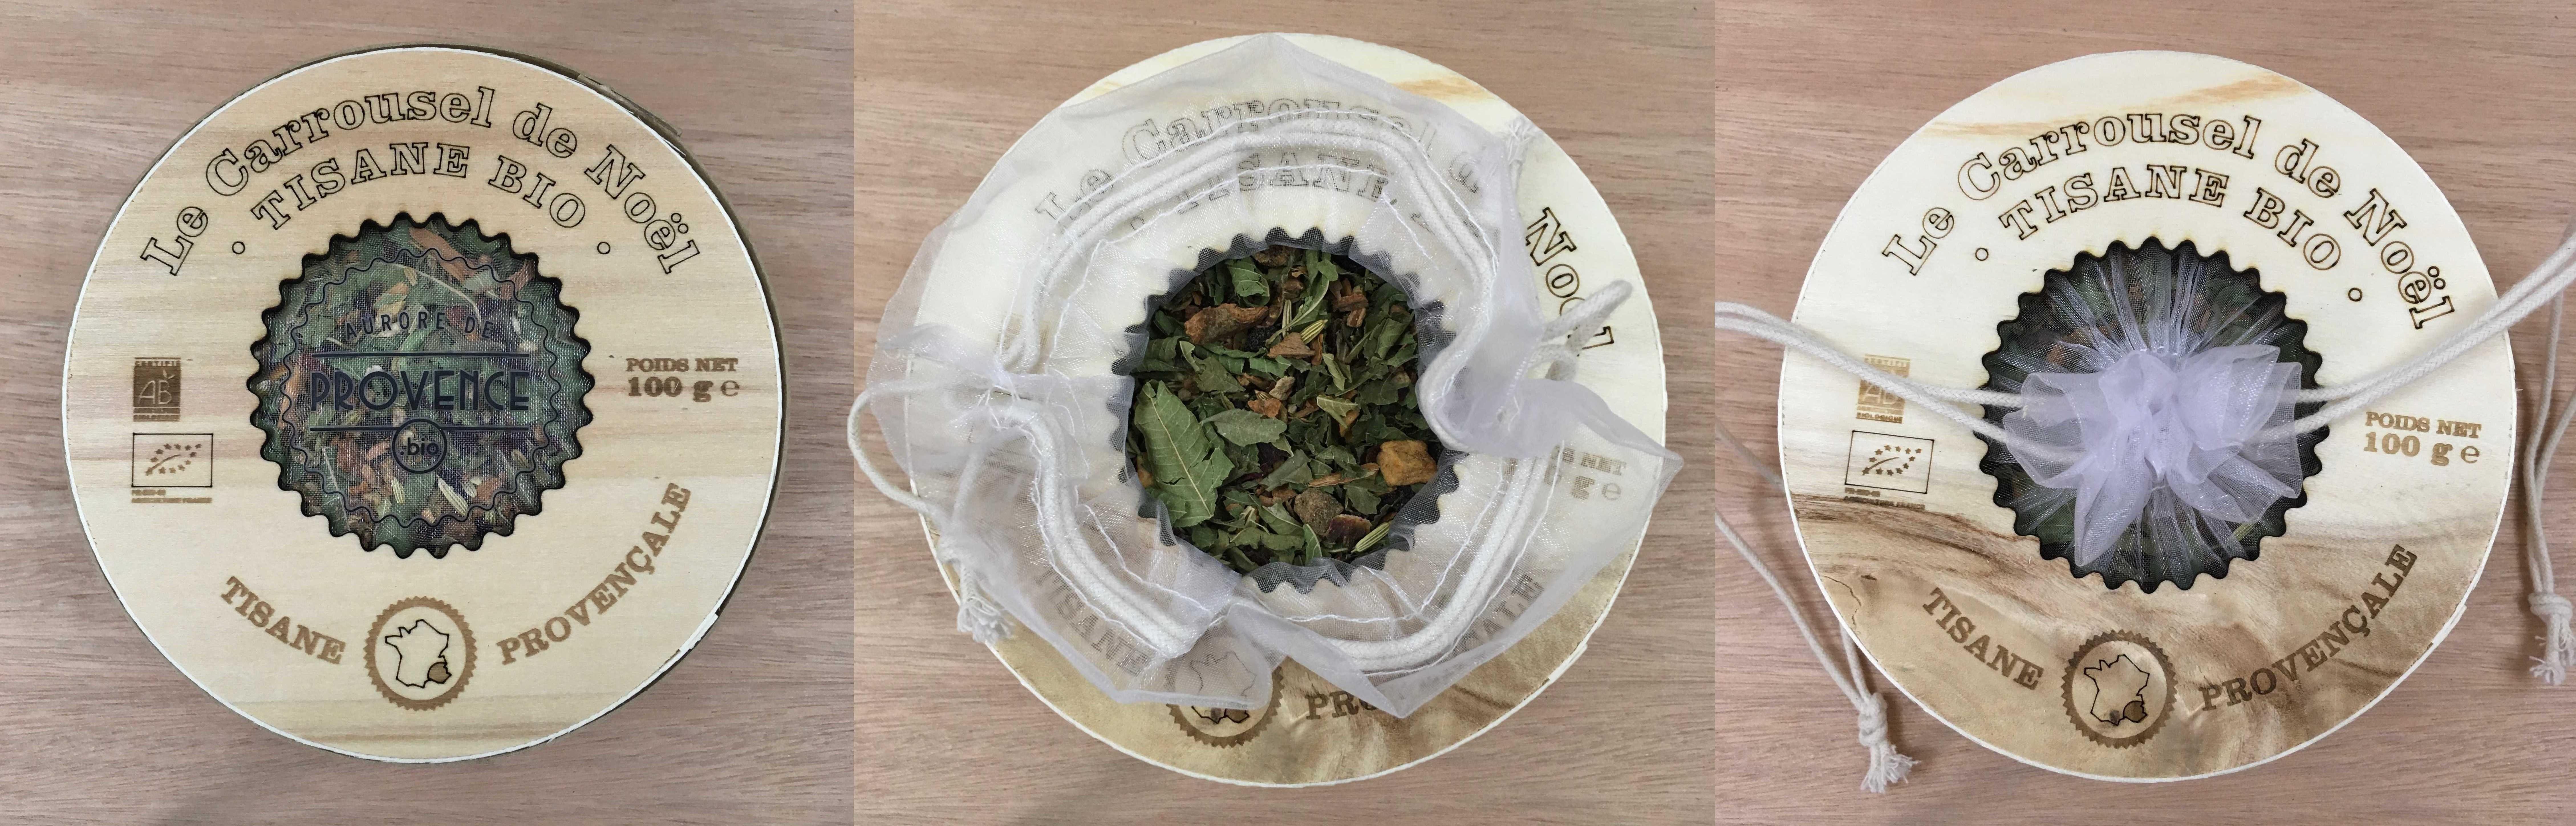 Our organic christmas herbal tea : Le Carrousel de Noël